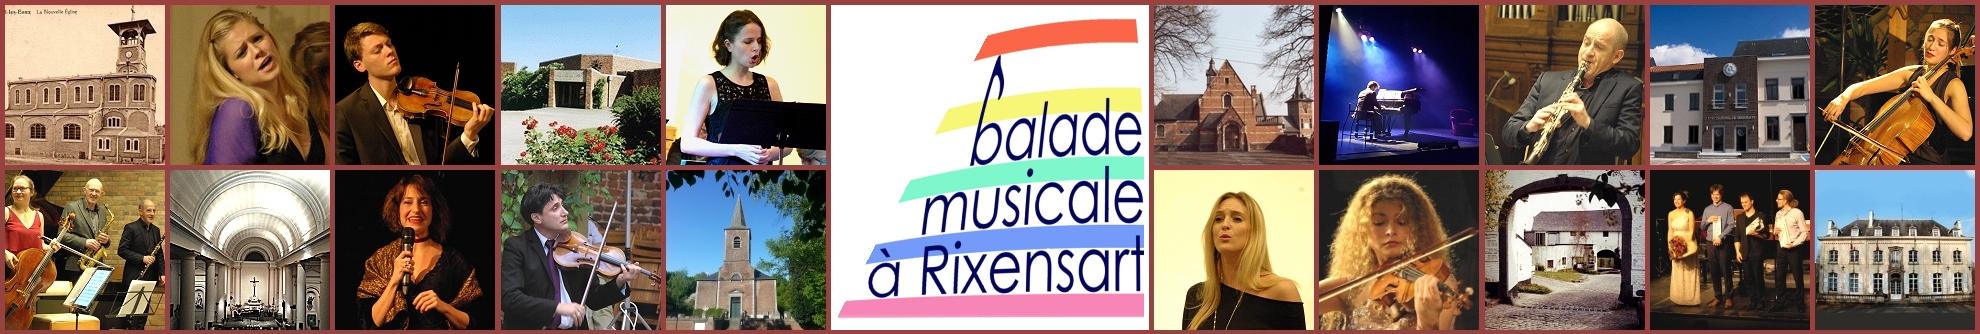 Balade musicale à Rixensart